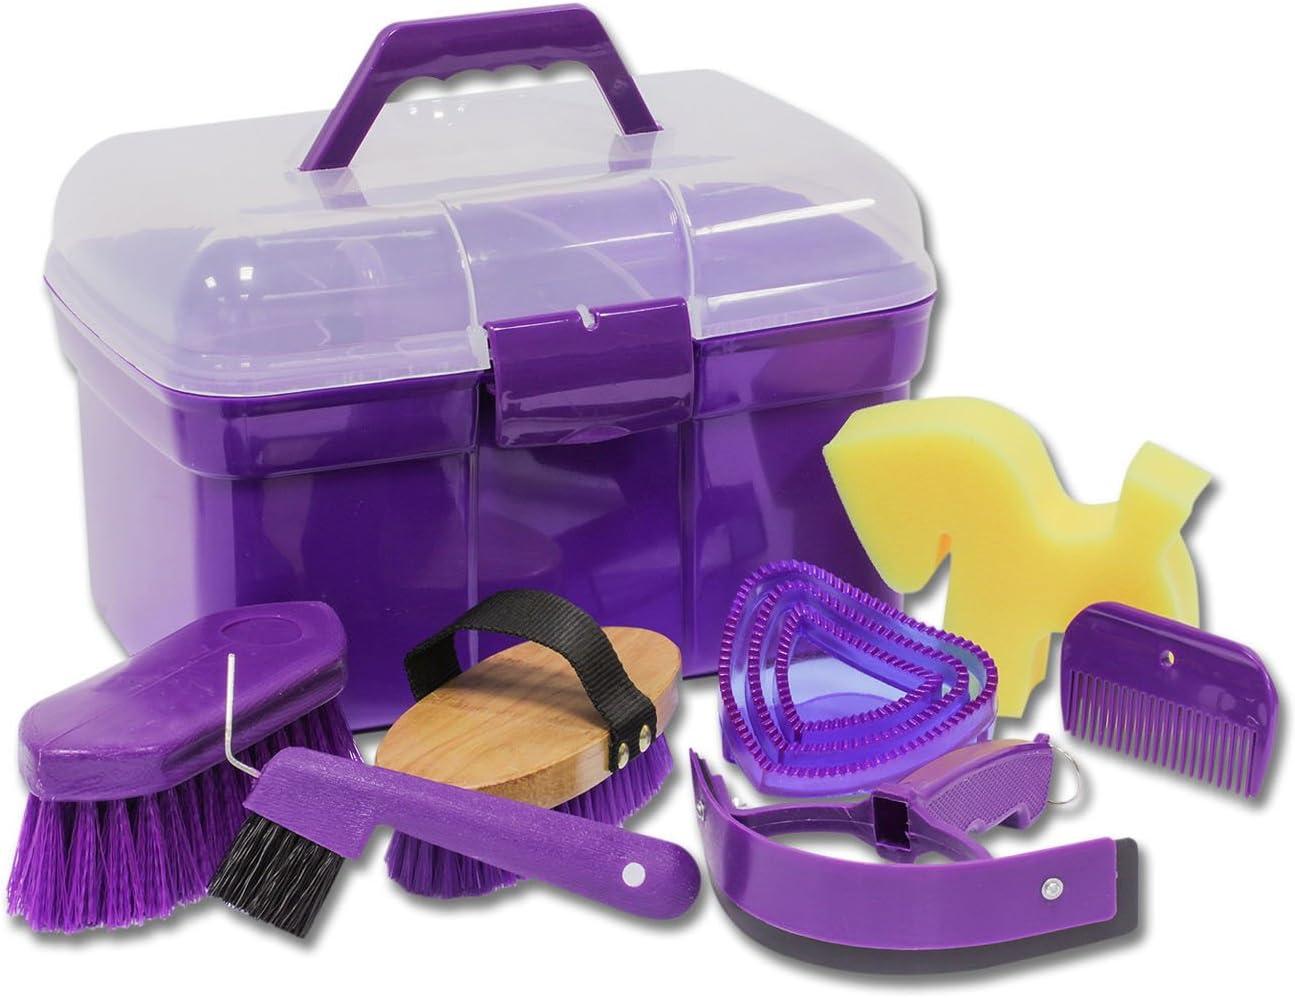 Amesbichler Caja con Accesorios de Limpieza para Caballos, Color Morado